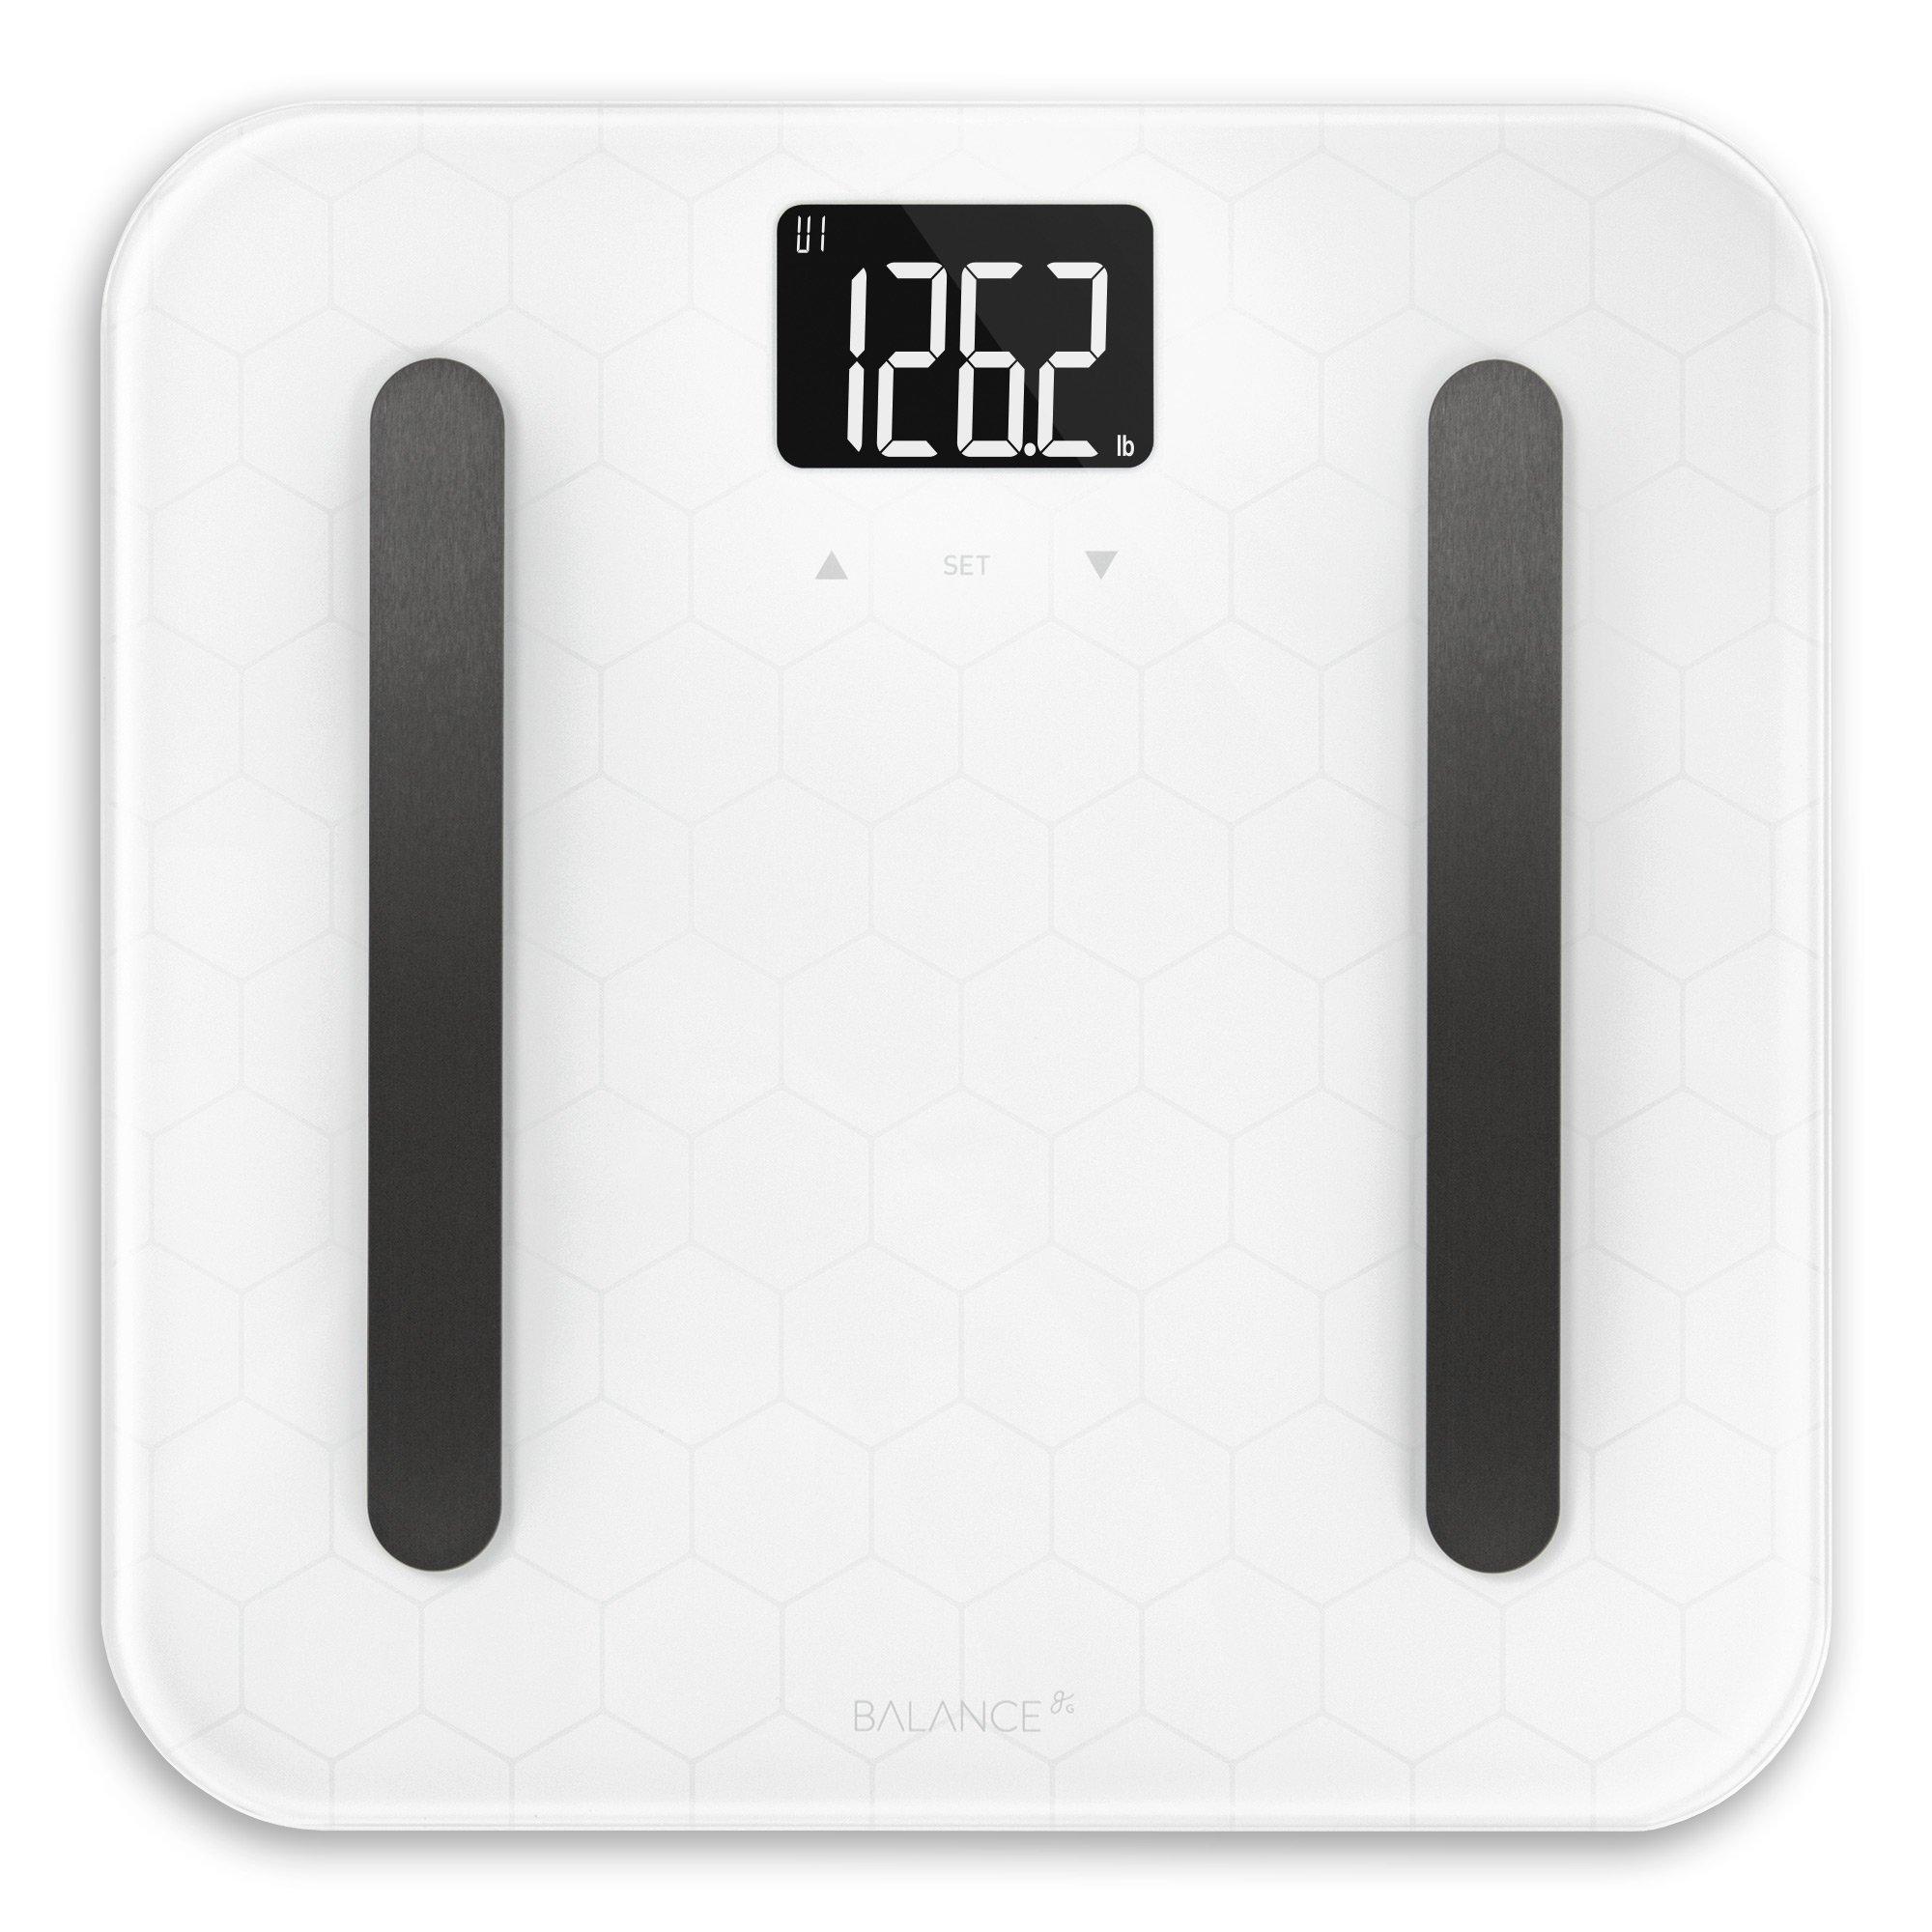 Designer Glass Body Composition White Bathroom Scale from GreaterGoods (White Body Composition)